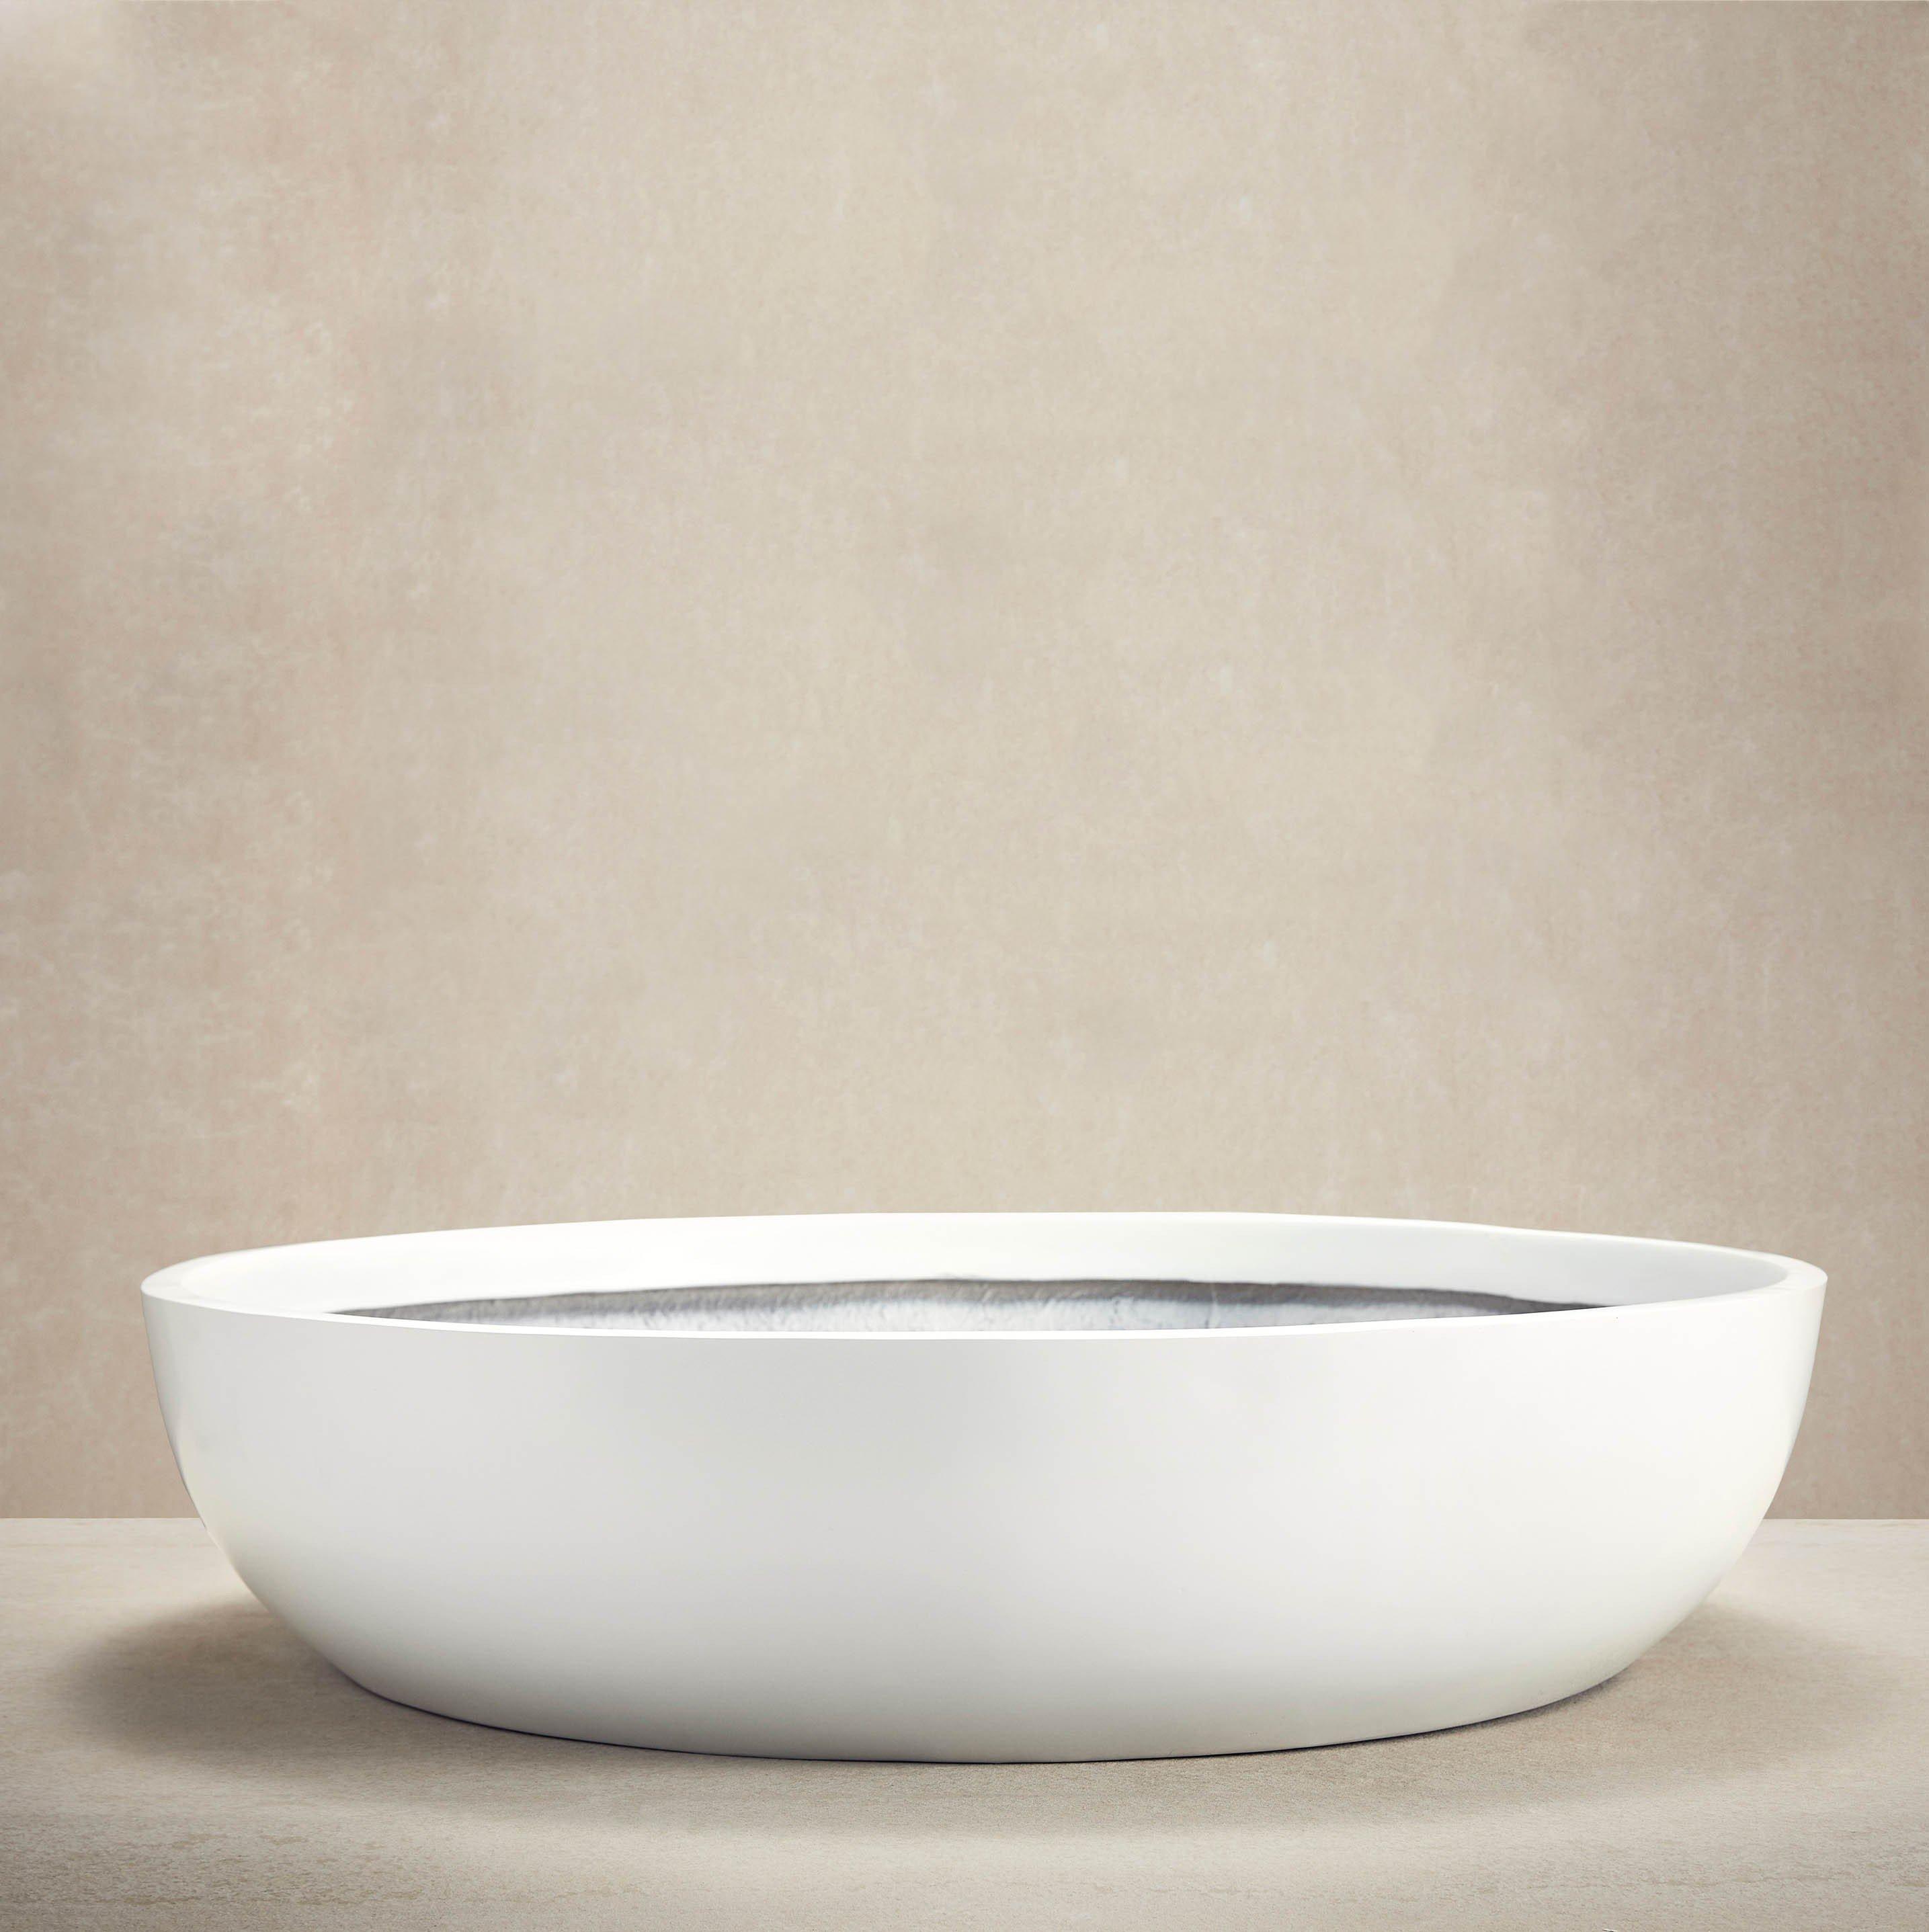 Decor Fibreglass Hero Pesa-low-bowl-hero